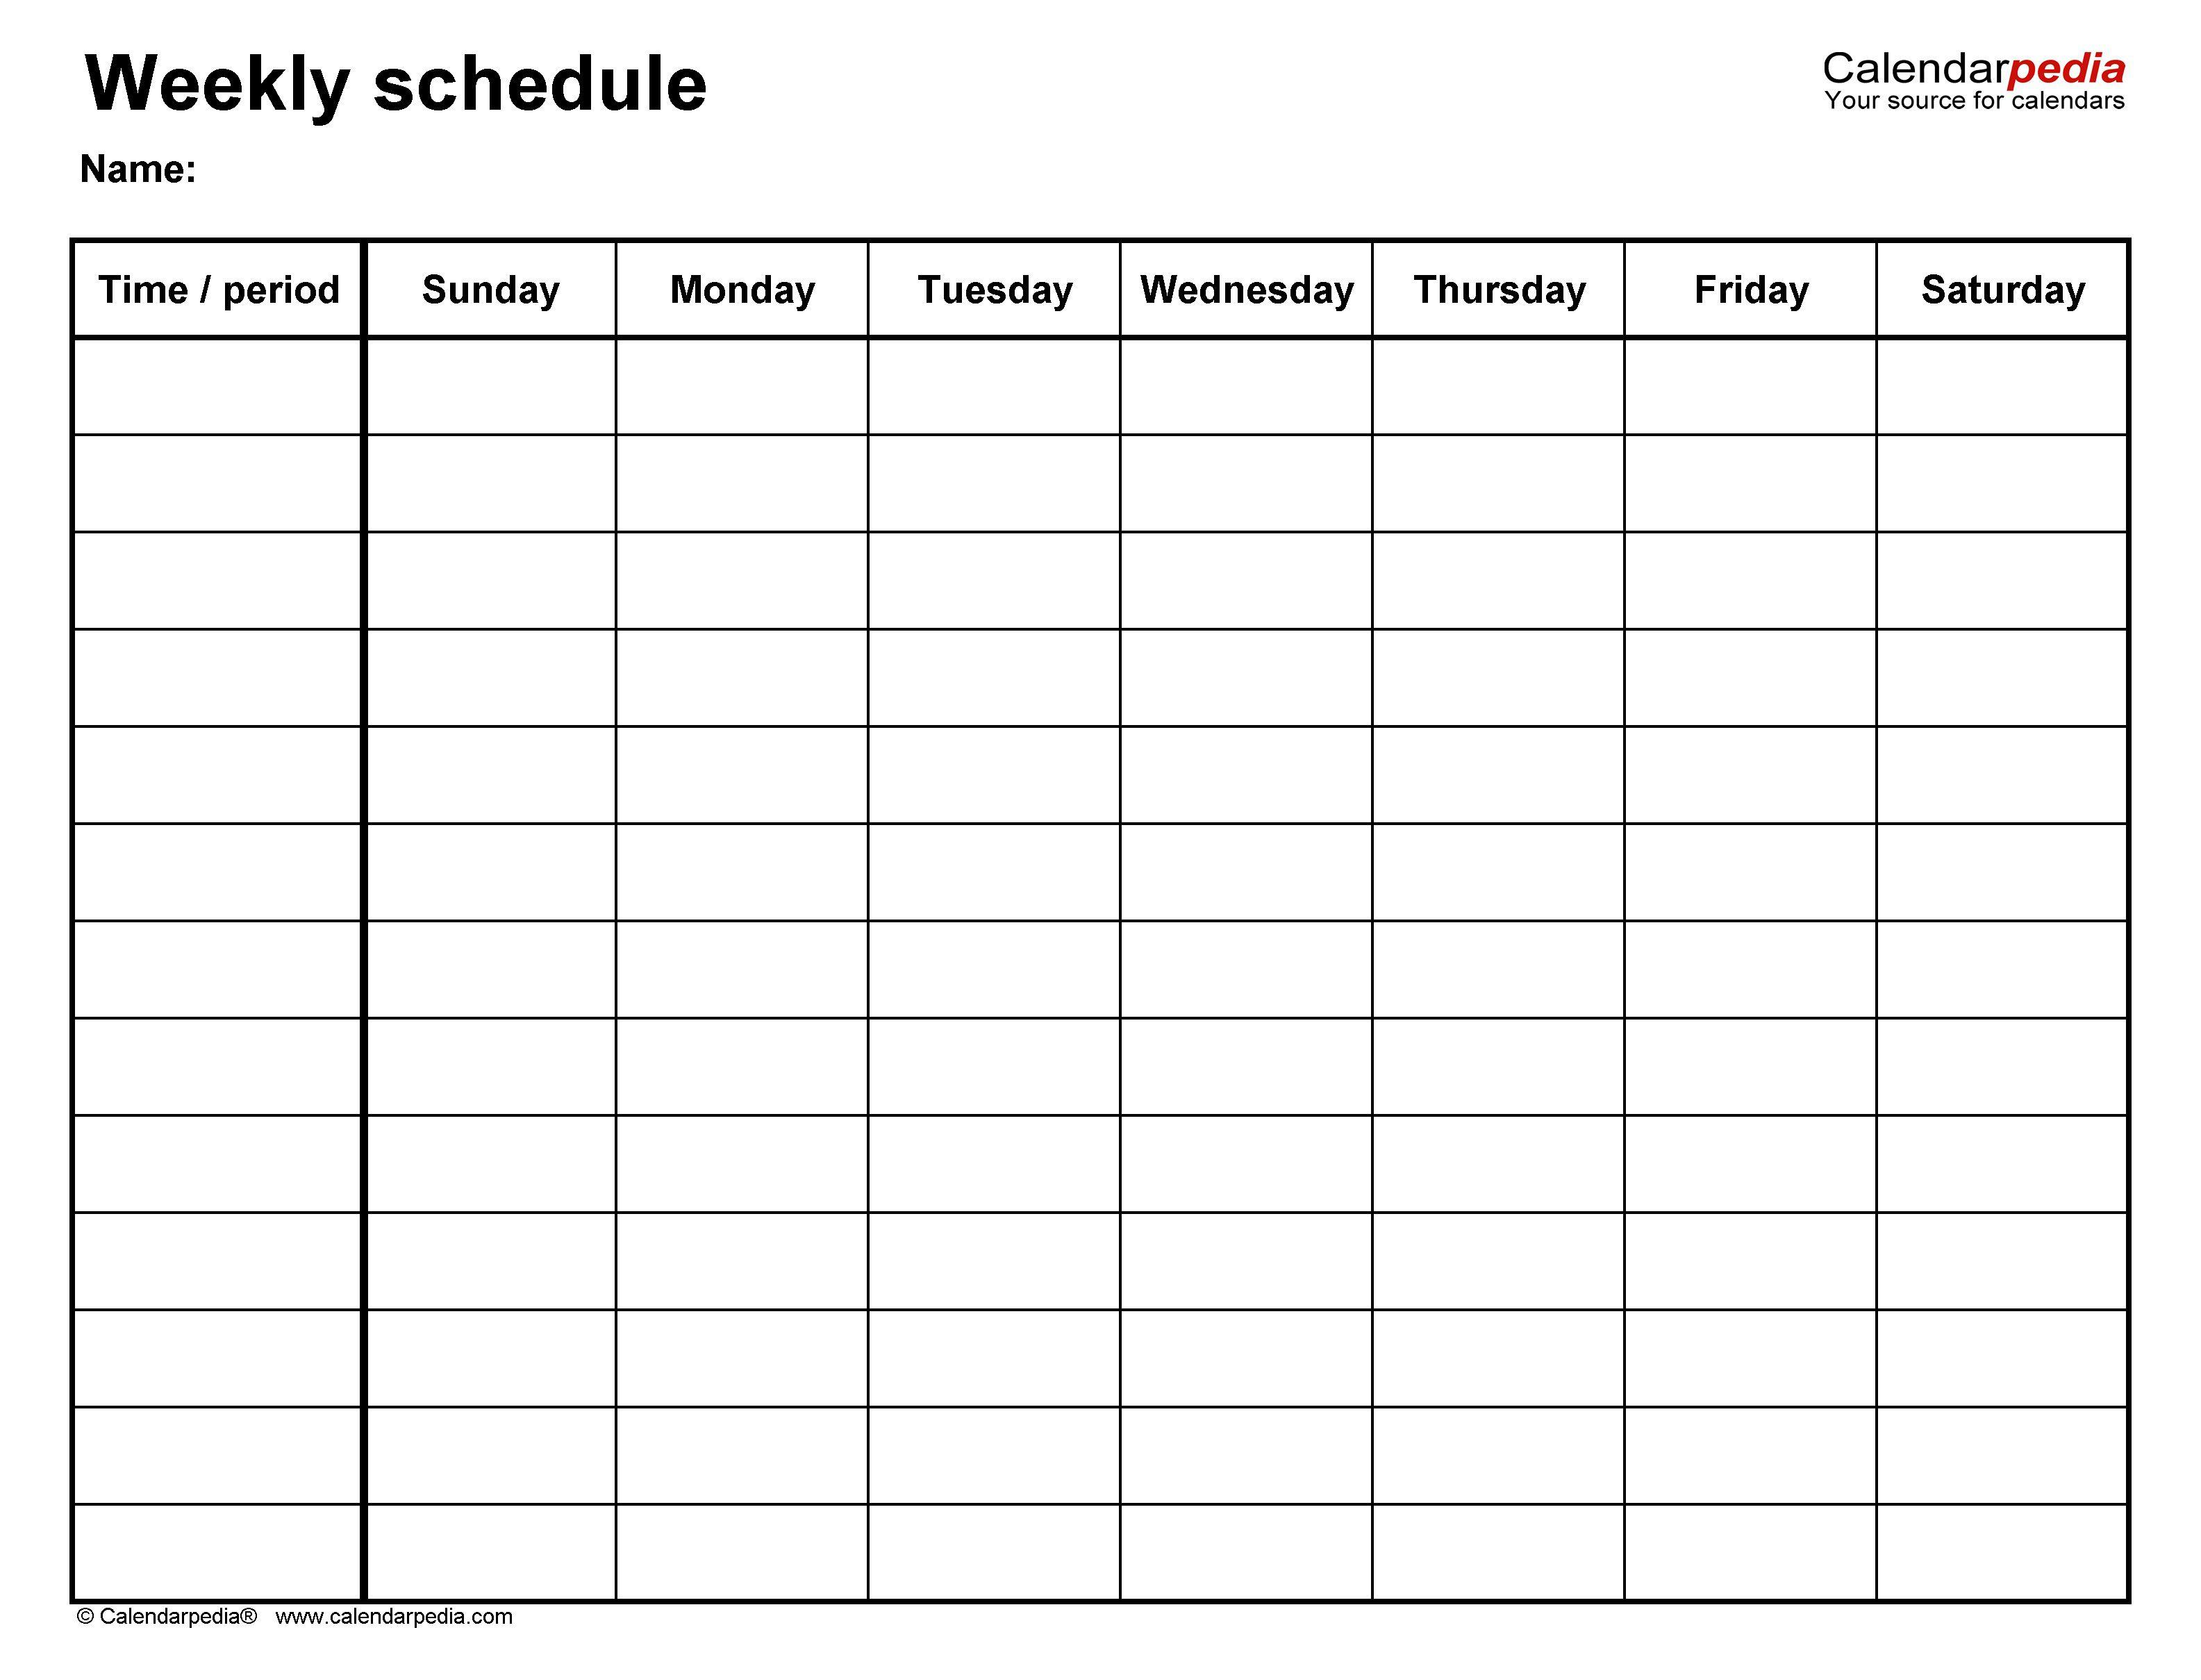 009 Shocking Hourly Schedule Template Word High Resolution  Calendar Microsoft WorkFull